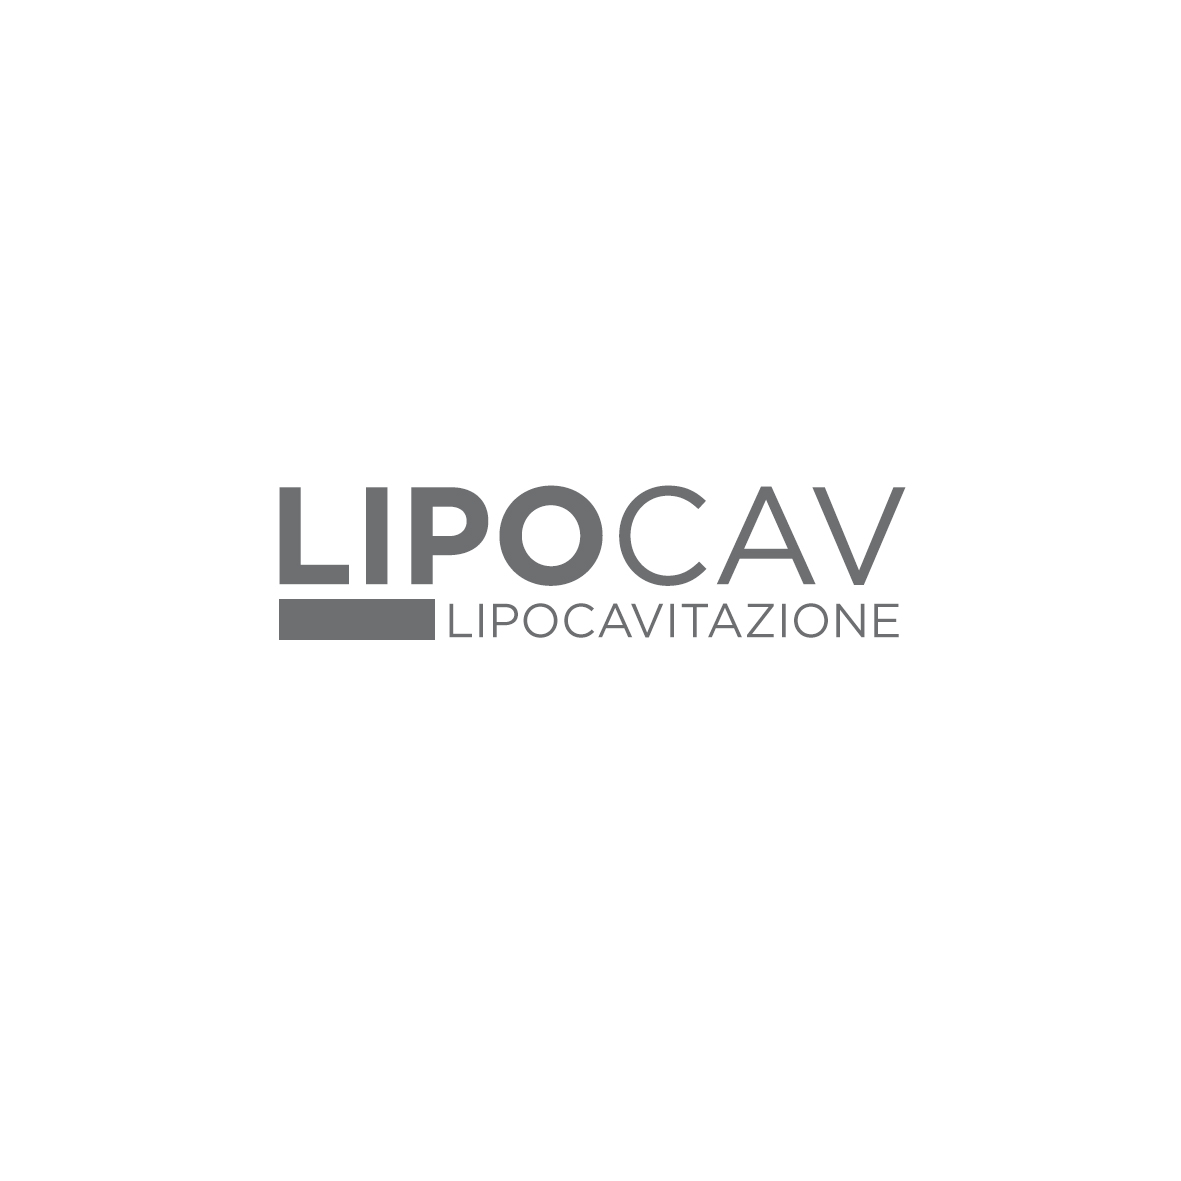 LIPOCAV